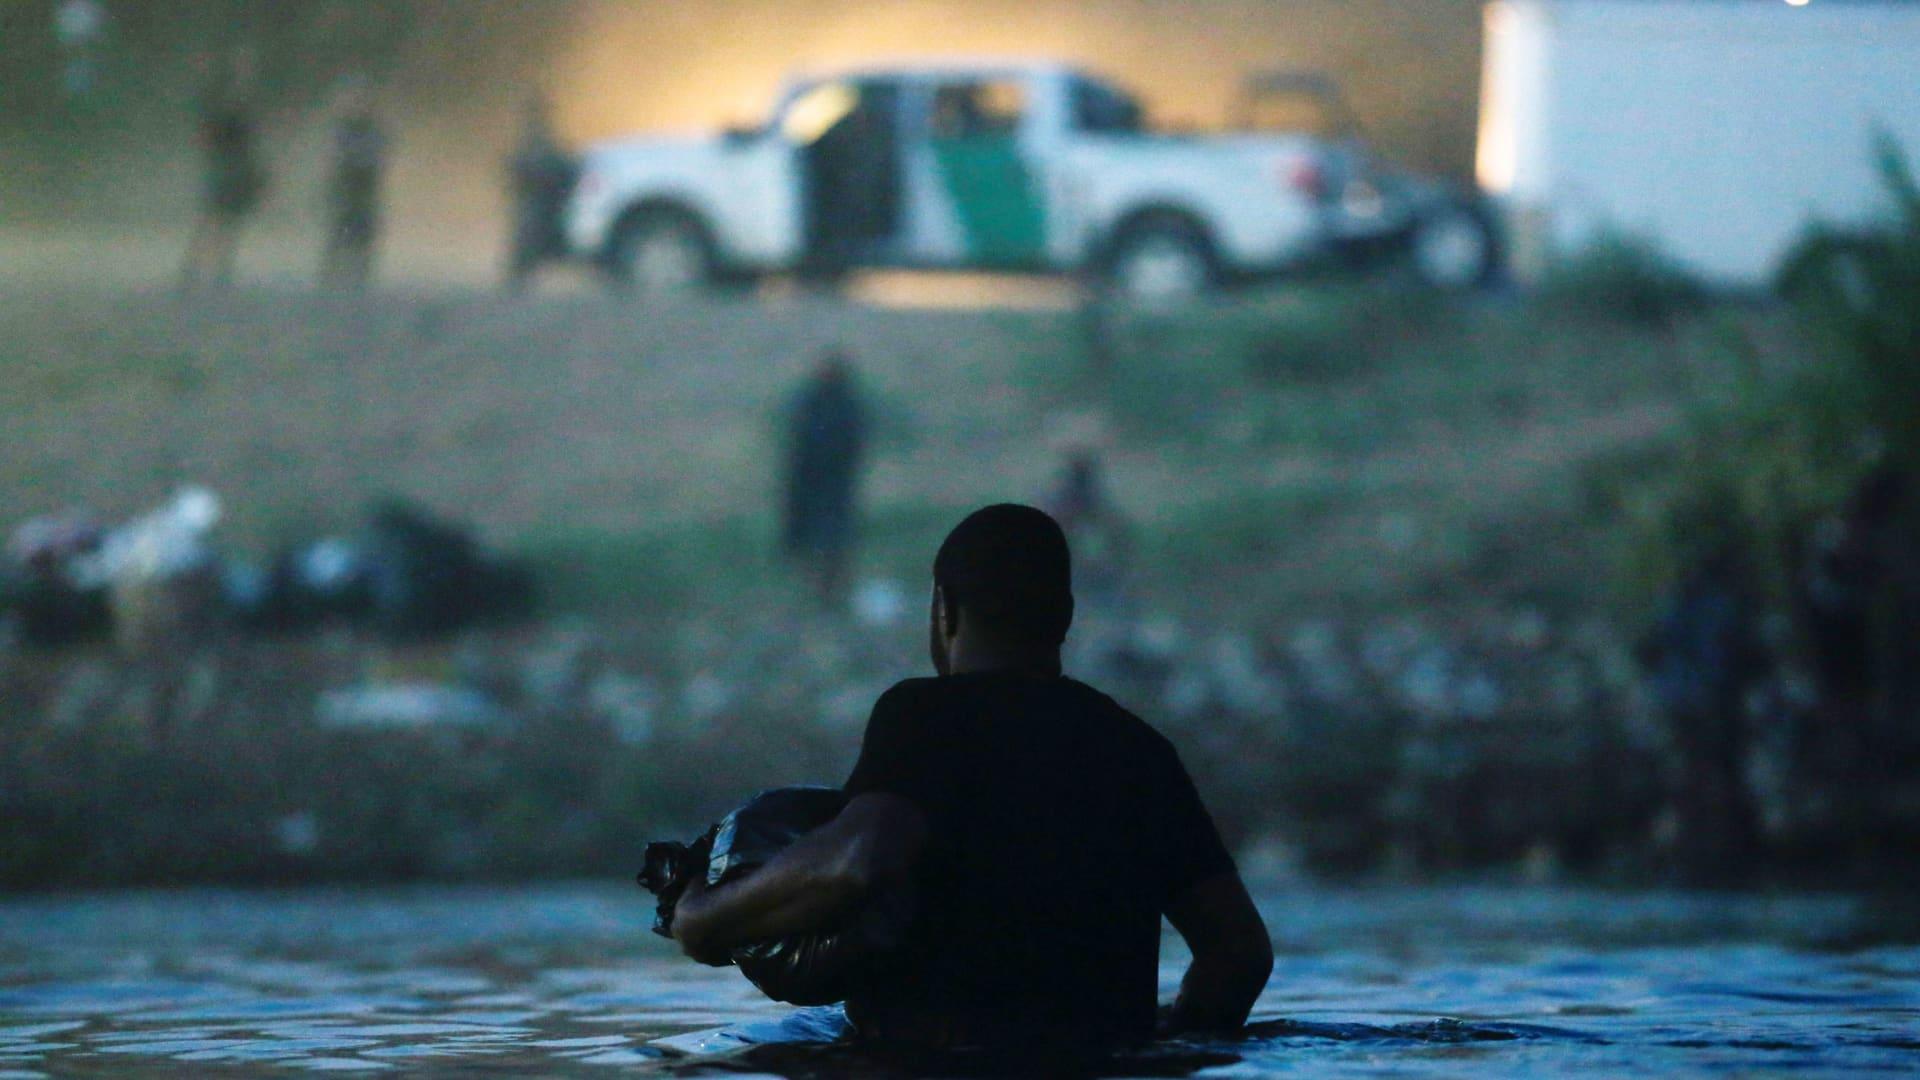 A migrant seeking refuge in the U.S. wades through the Rio Grande river from Ciudad Acuna, Mexico toward Del Rio, Texas, U.S. after getting supplies, in Ciudad Acuna, Mexico September 22, 2021.